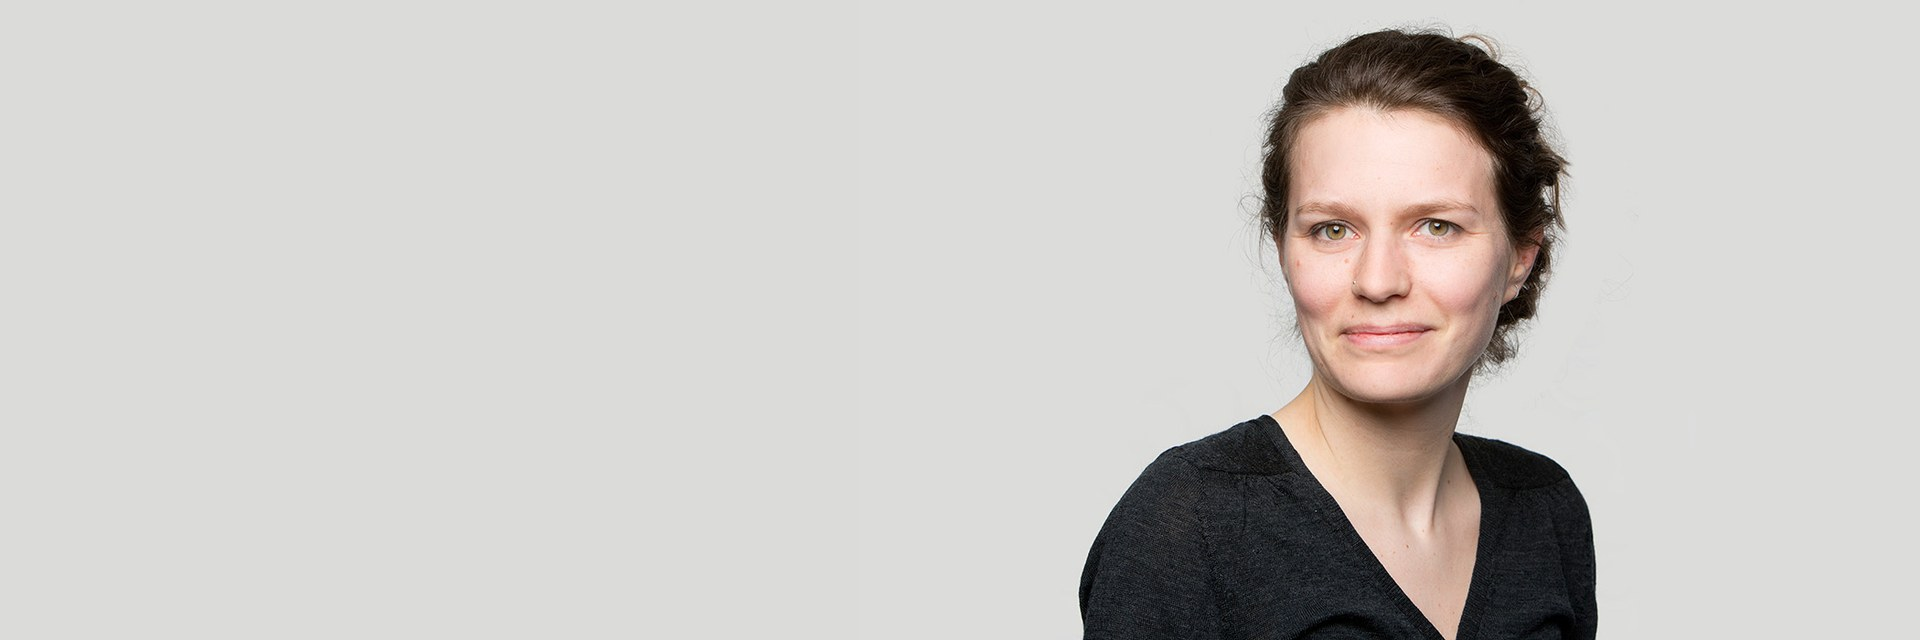 Fabienne Rotzetter, MA